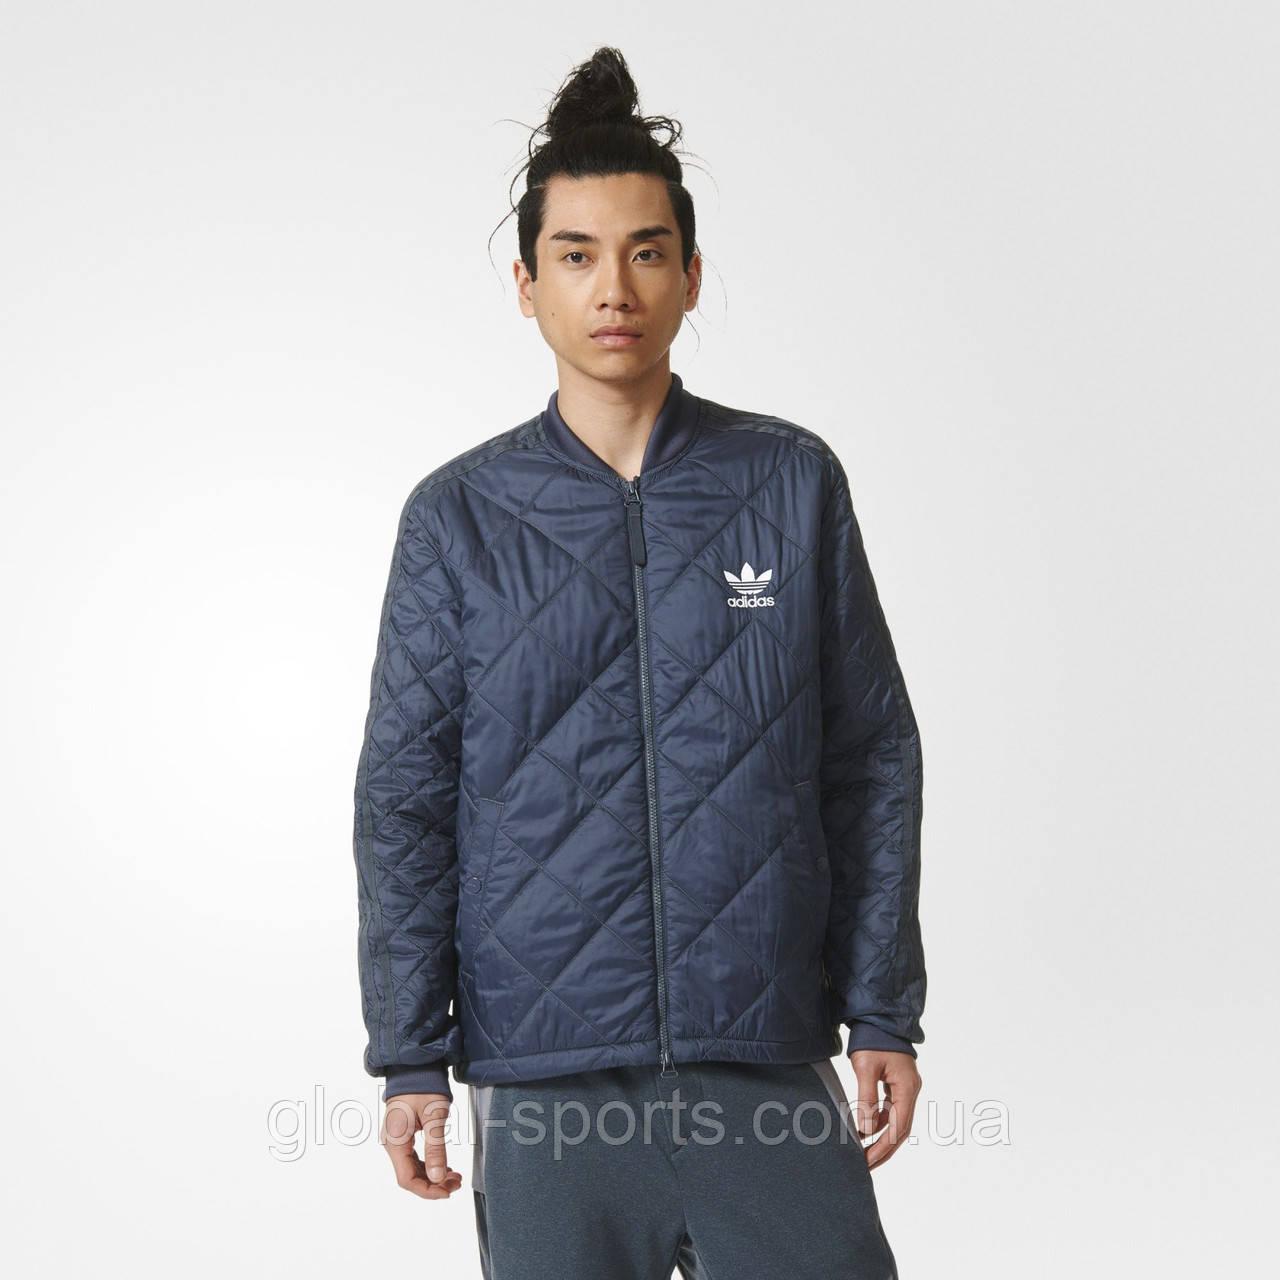 b3593b6b65df Мужская куртка Adidas Quilted Superstar, Артикул AY9143 - магазин Global  Sport в Харькове